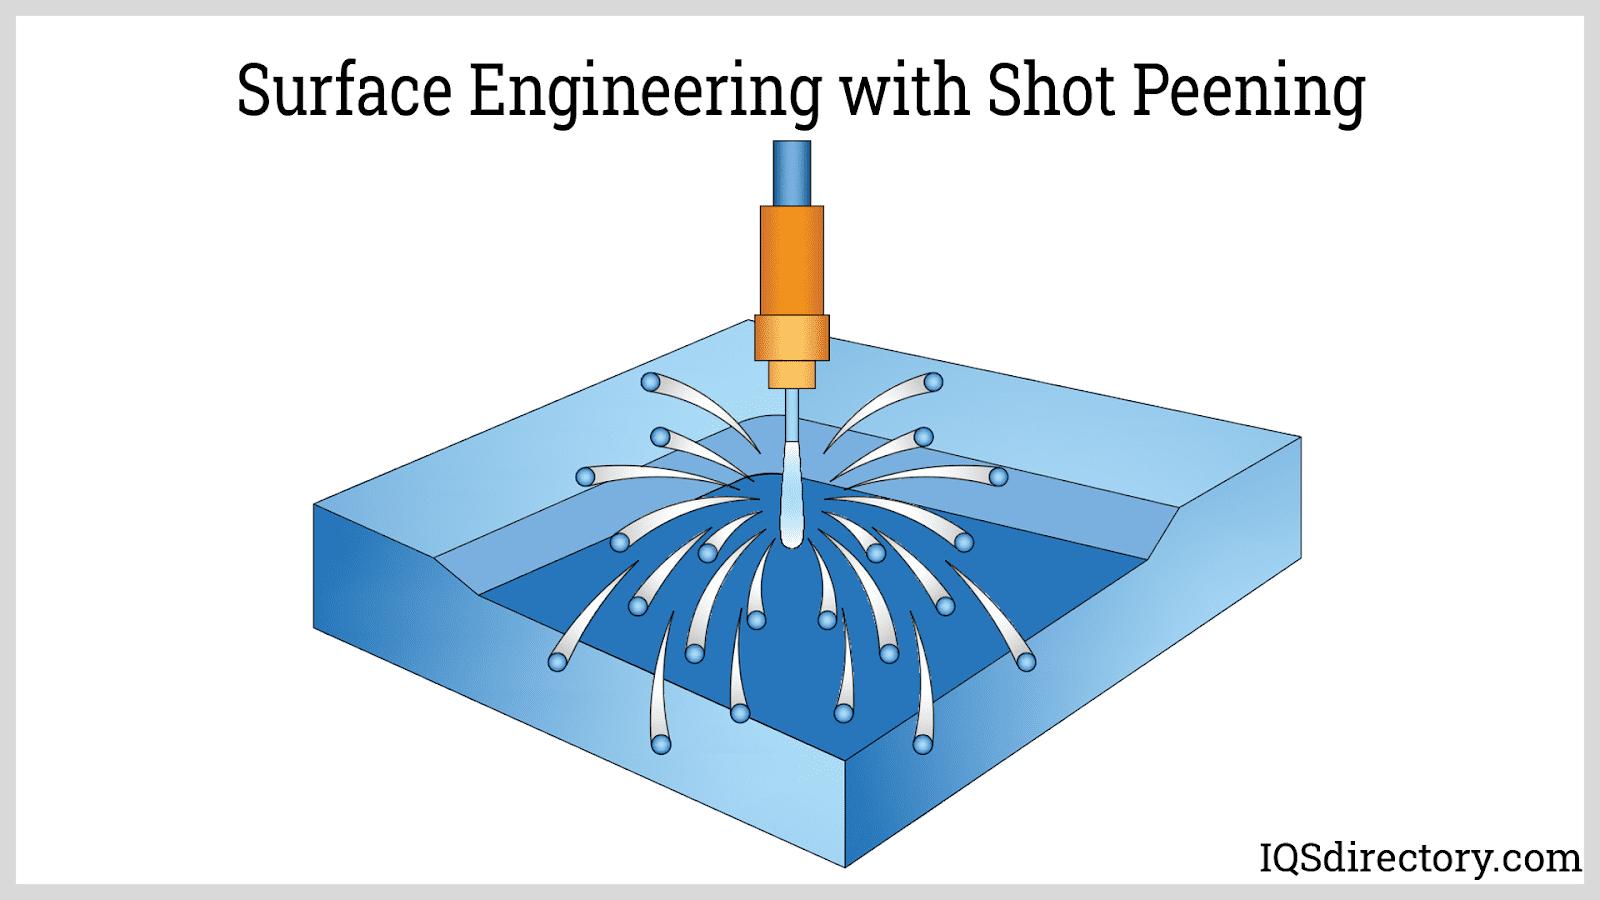 Surface Engineering with Shot Peening